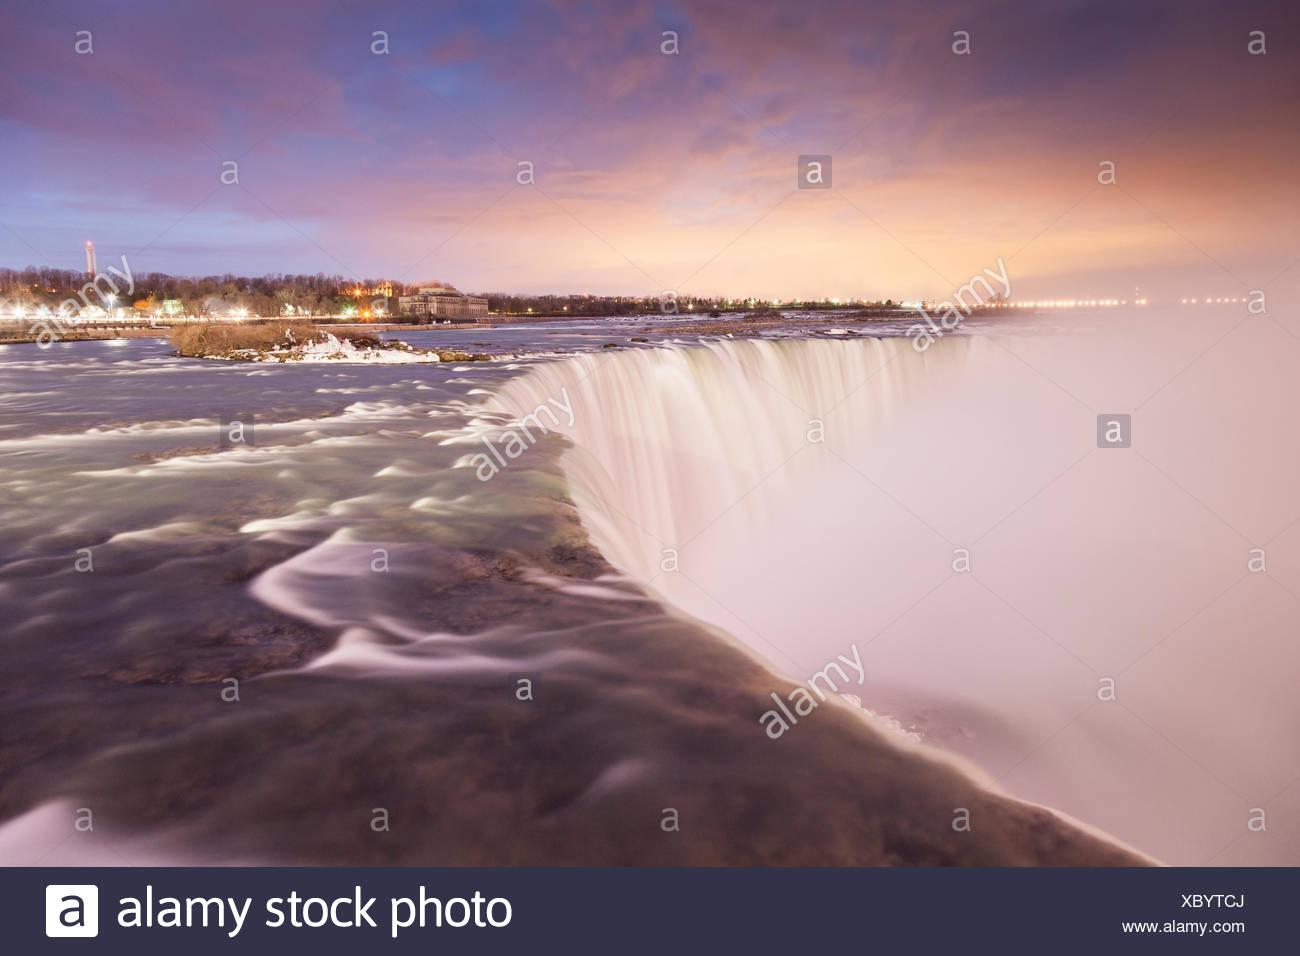 Canadian Horseshoe Falls, Niagara Falls, Queen Victoria Park, Ontario - Stock Image